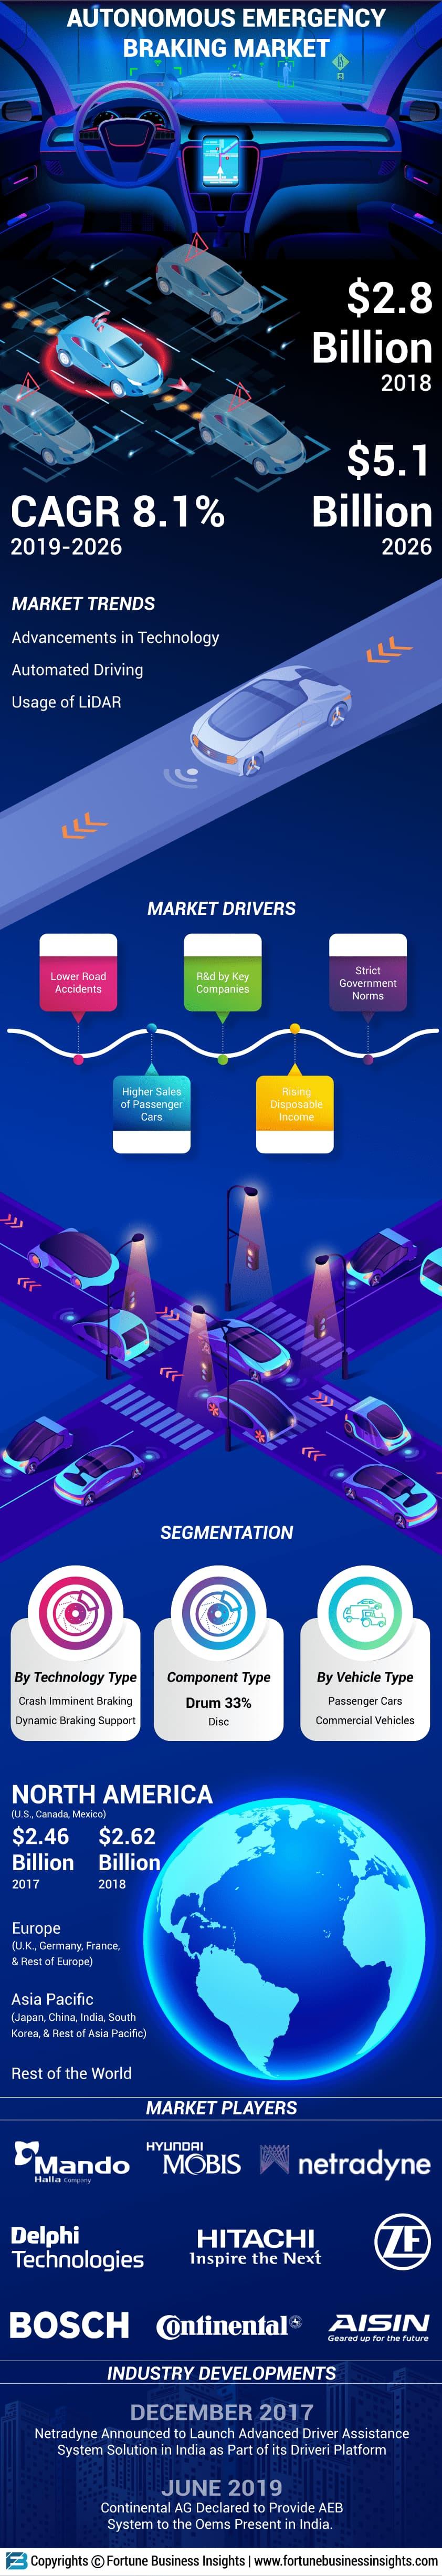 Automotive Autonomous Emergency Braking System (Aeb) Market